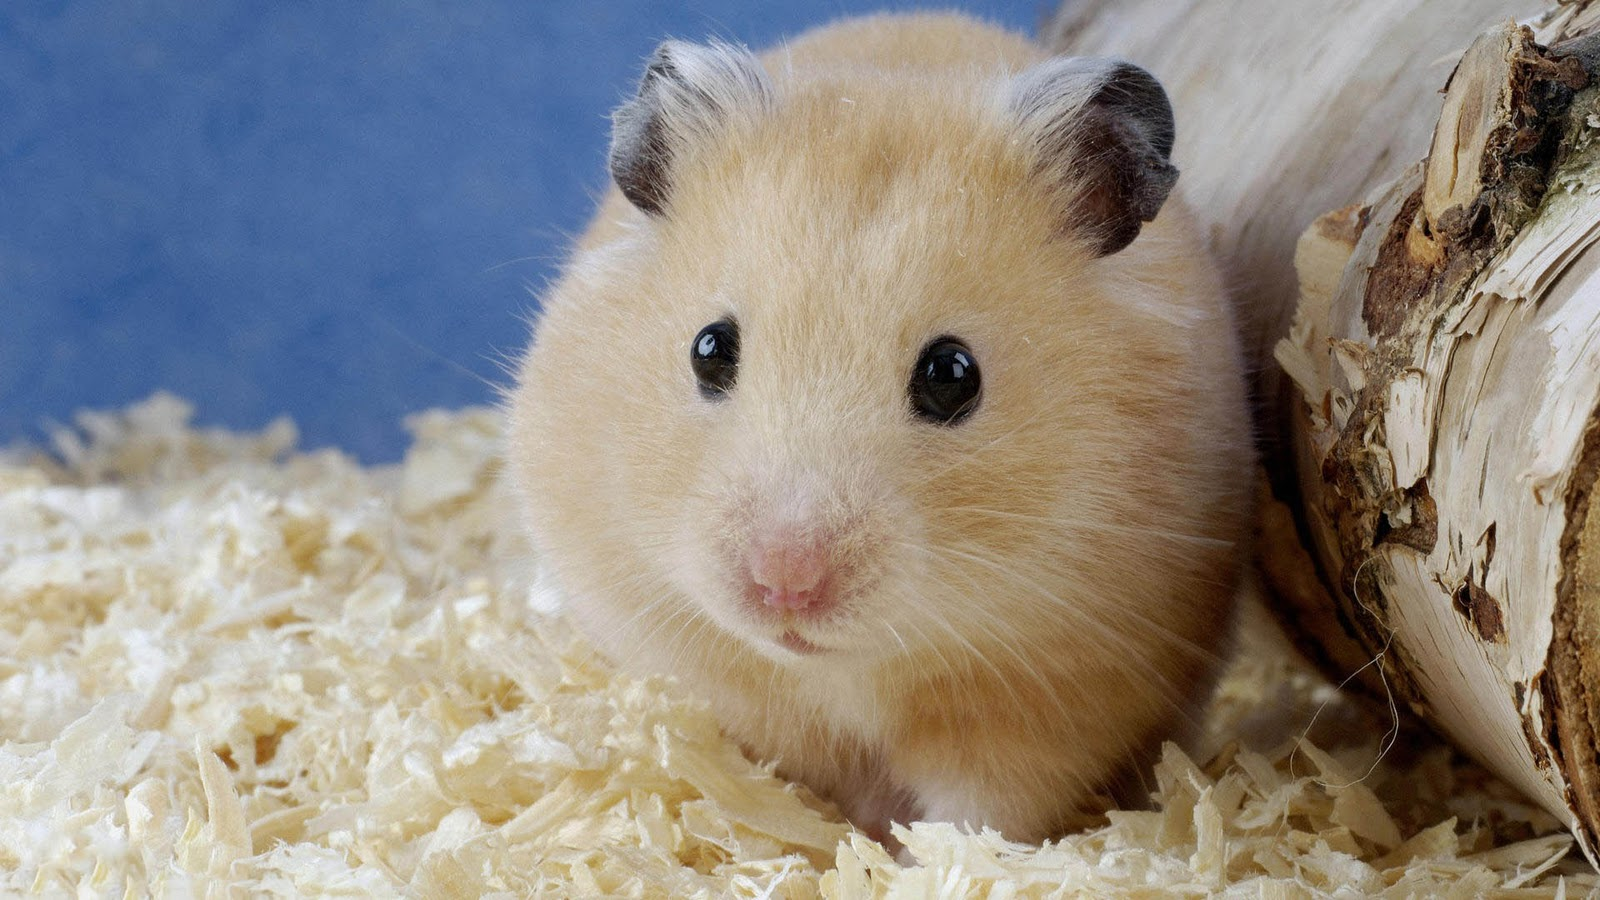 Sweet Cute Wallpapers Hamster Achtergronden Hd Wallpapers